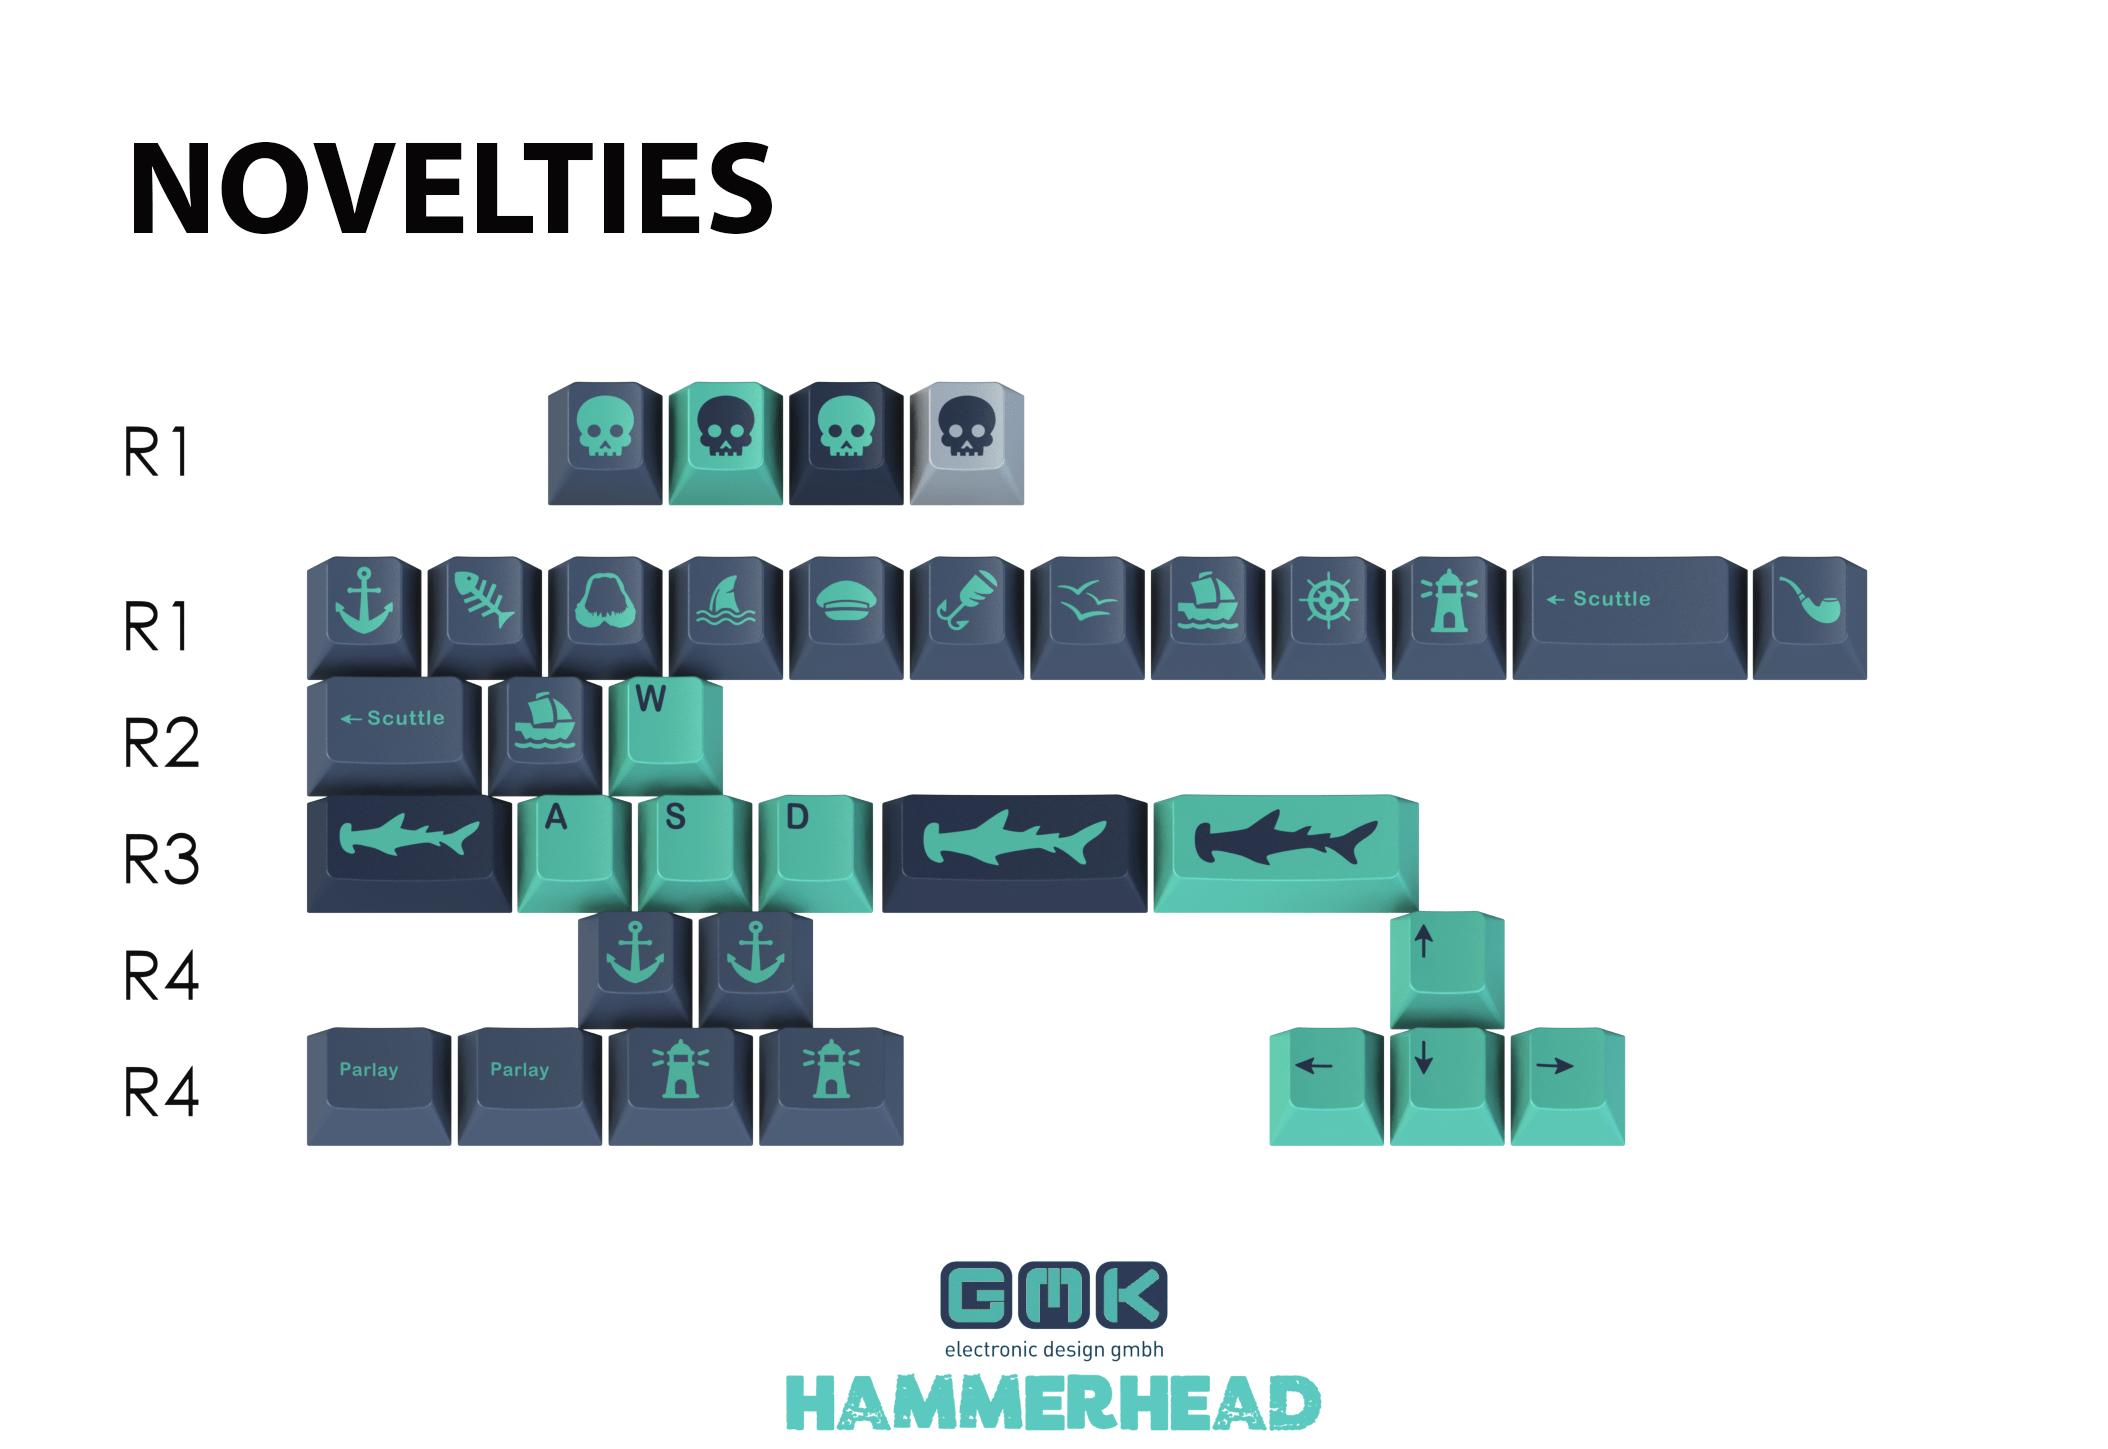 gmk-hammerhead-novelty-final